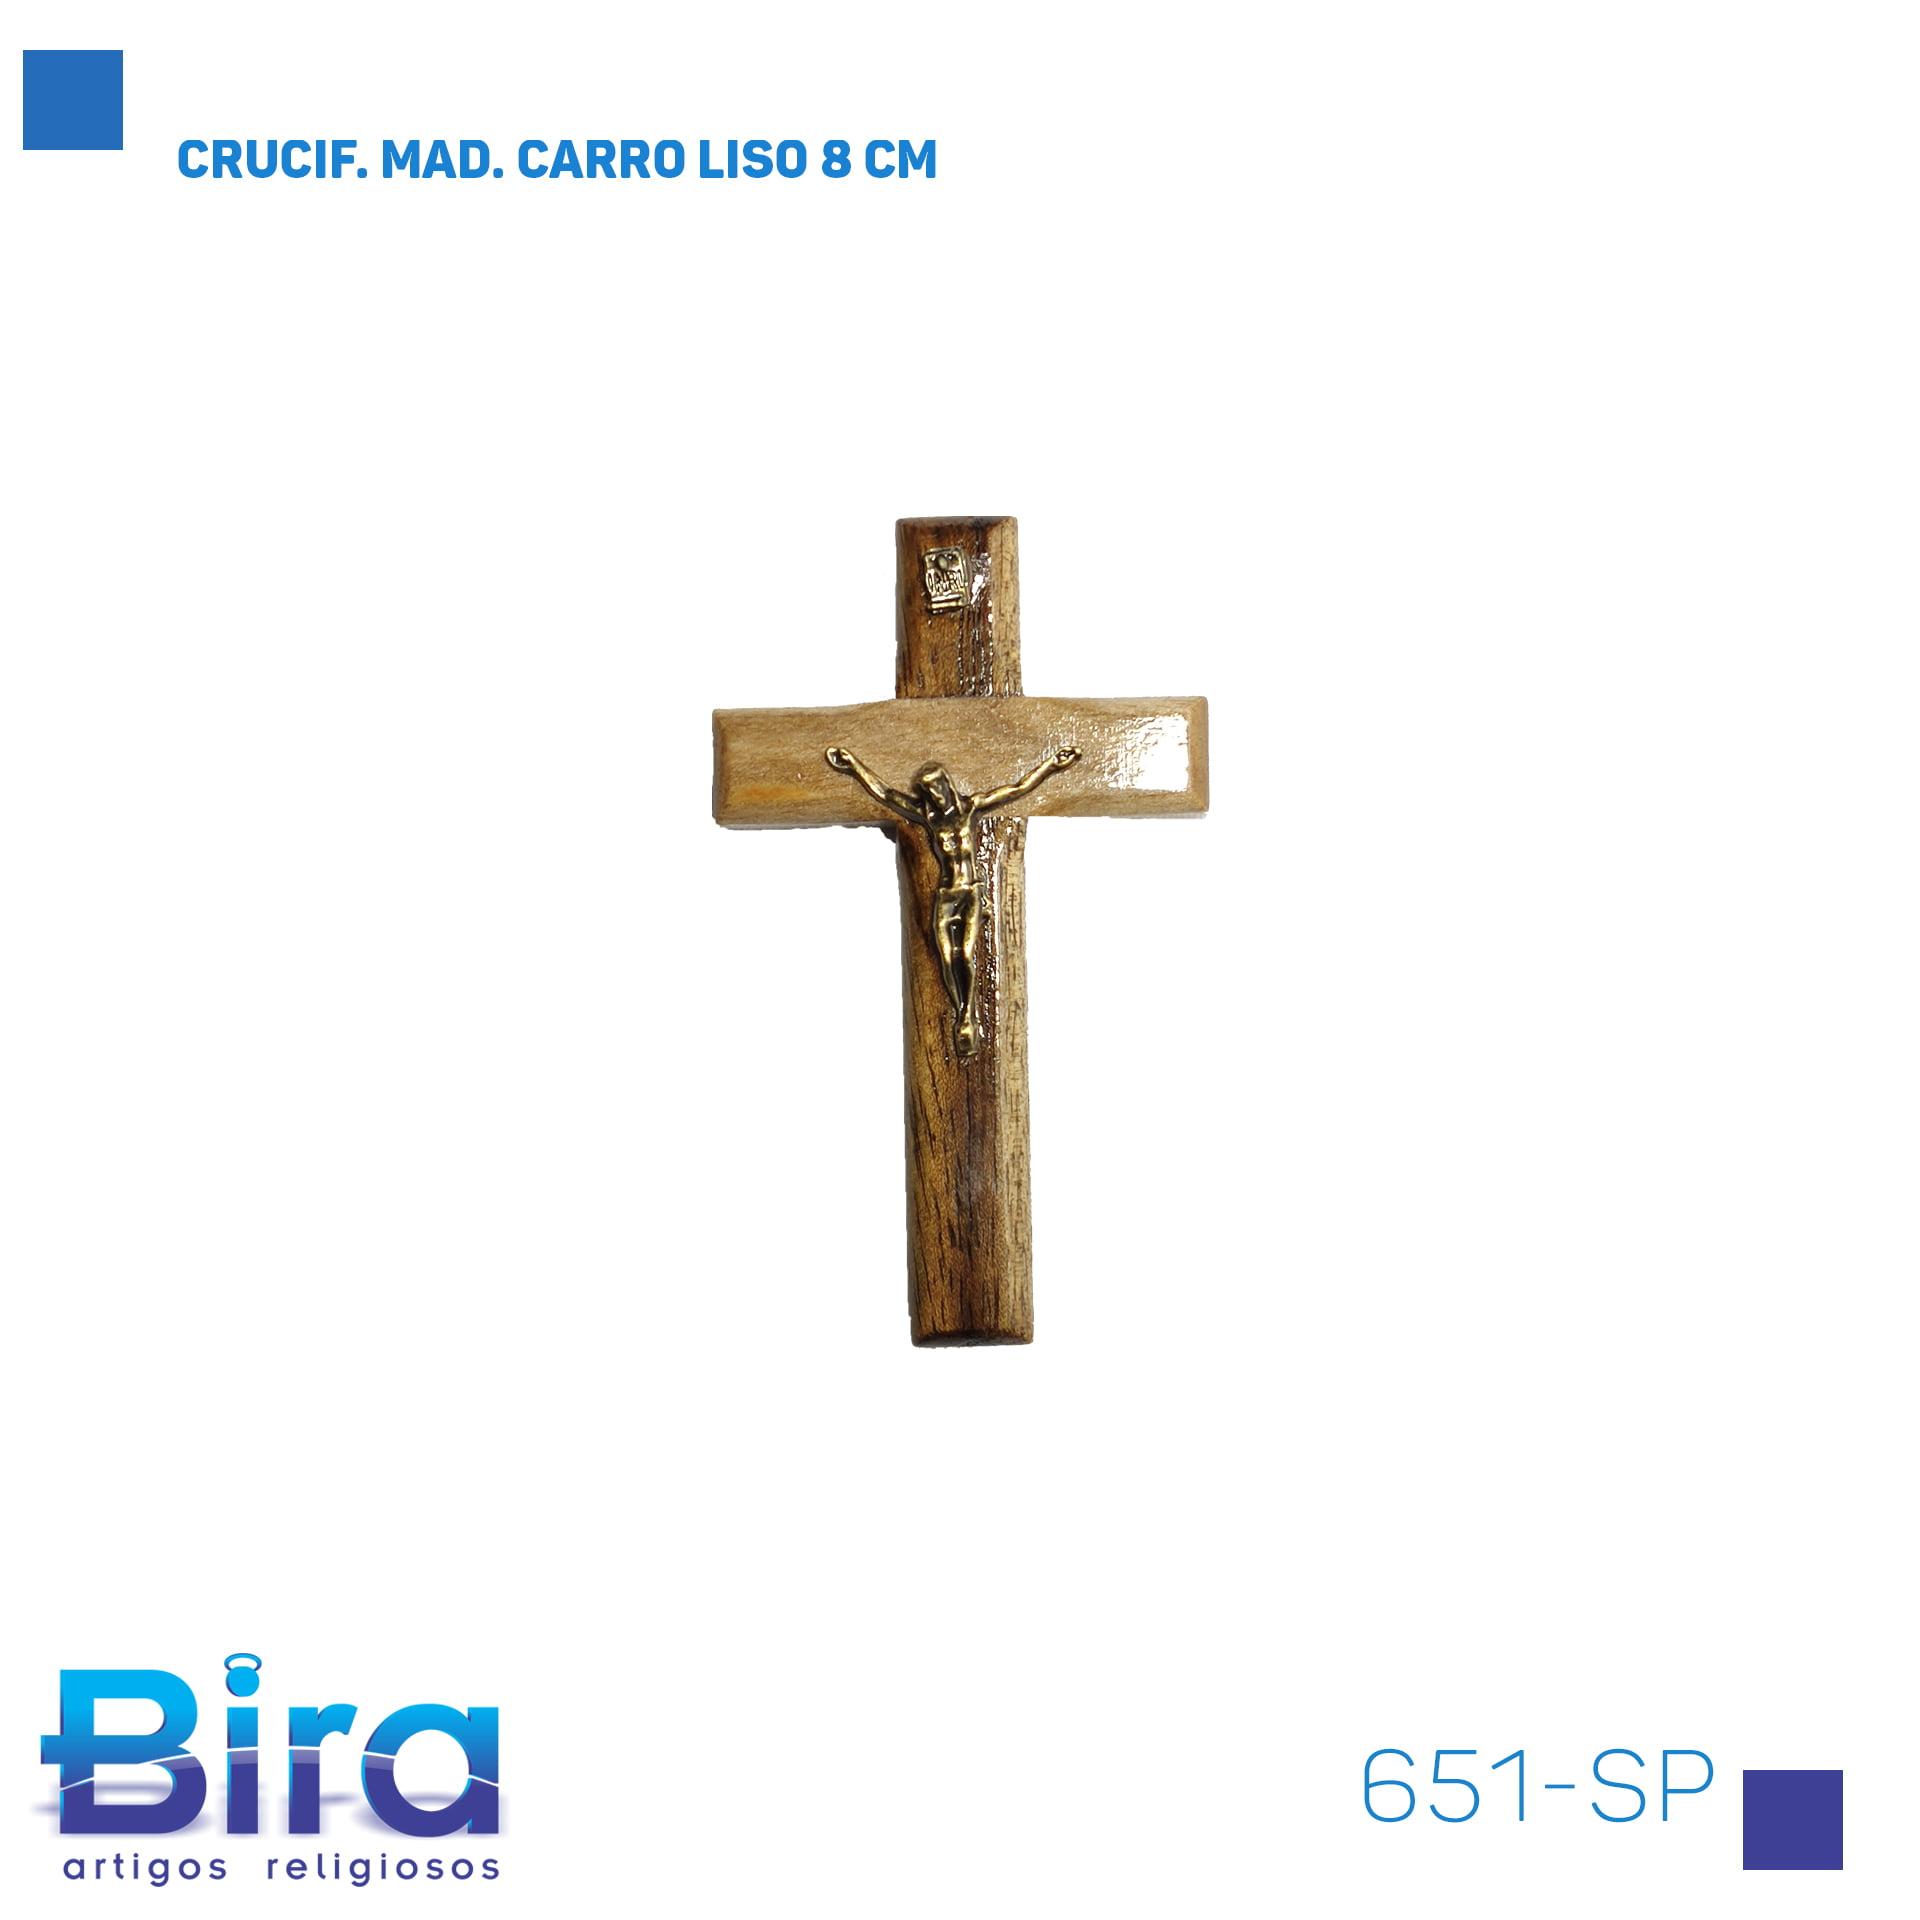 Bira Artigos Religiosos - CRUCIF. MAD. CARRO LISO 8 CM Cód. 651-SP